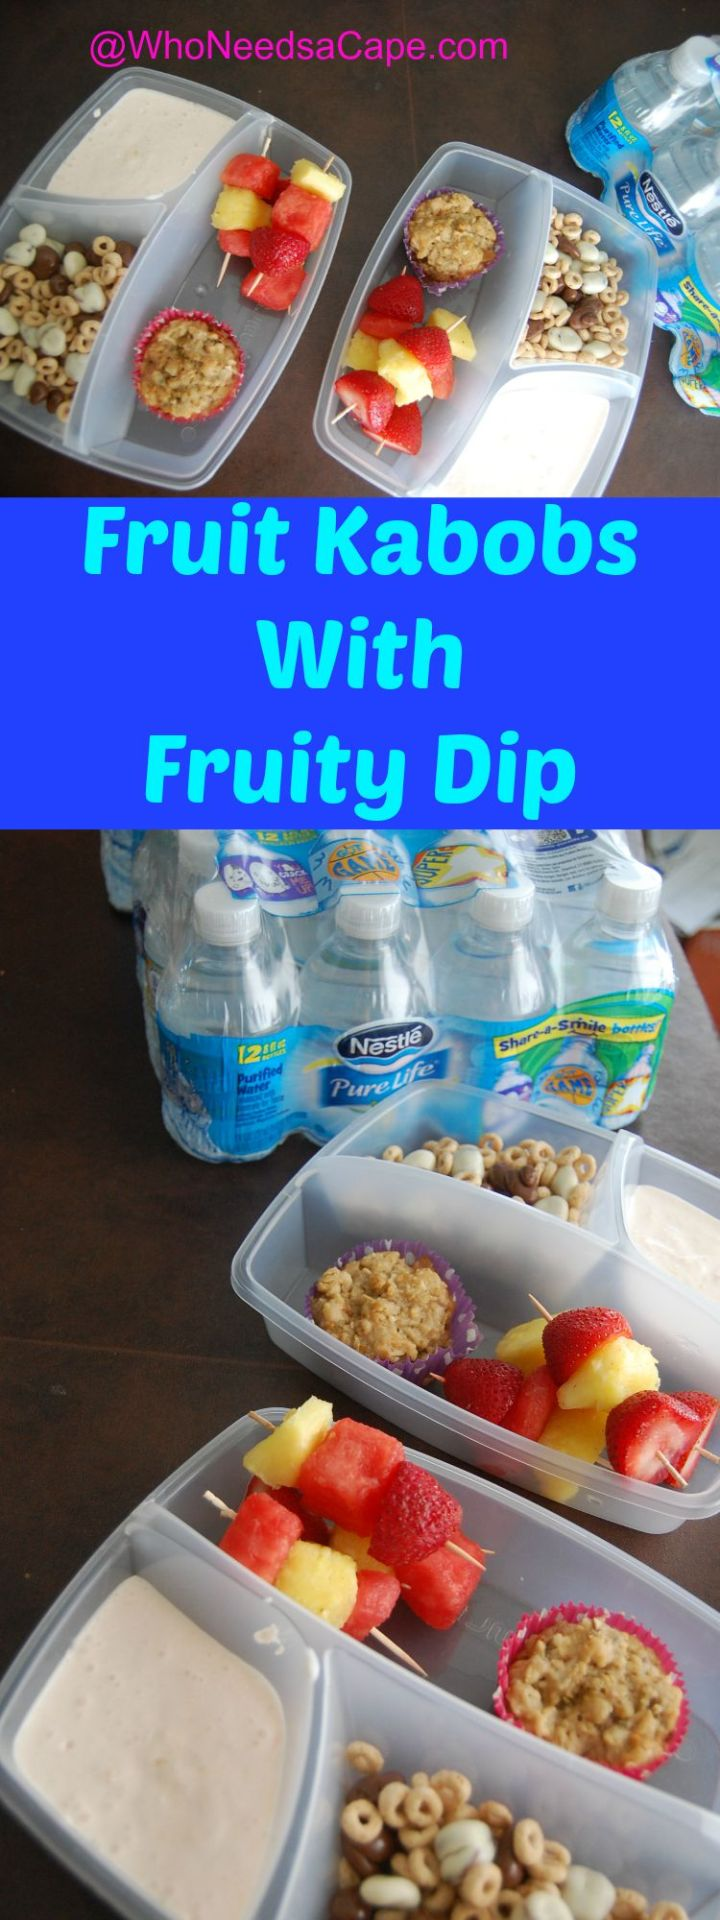 Fruit Kabobs with Fruity Dip 4